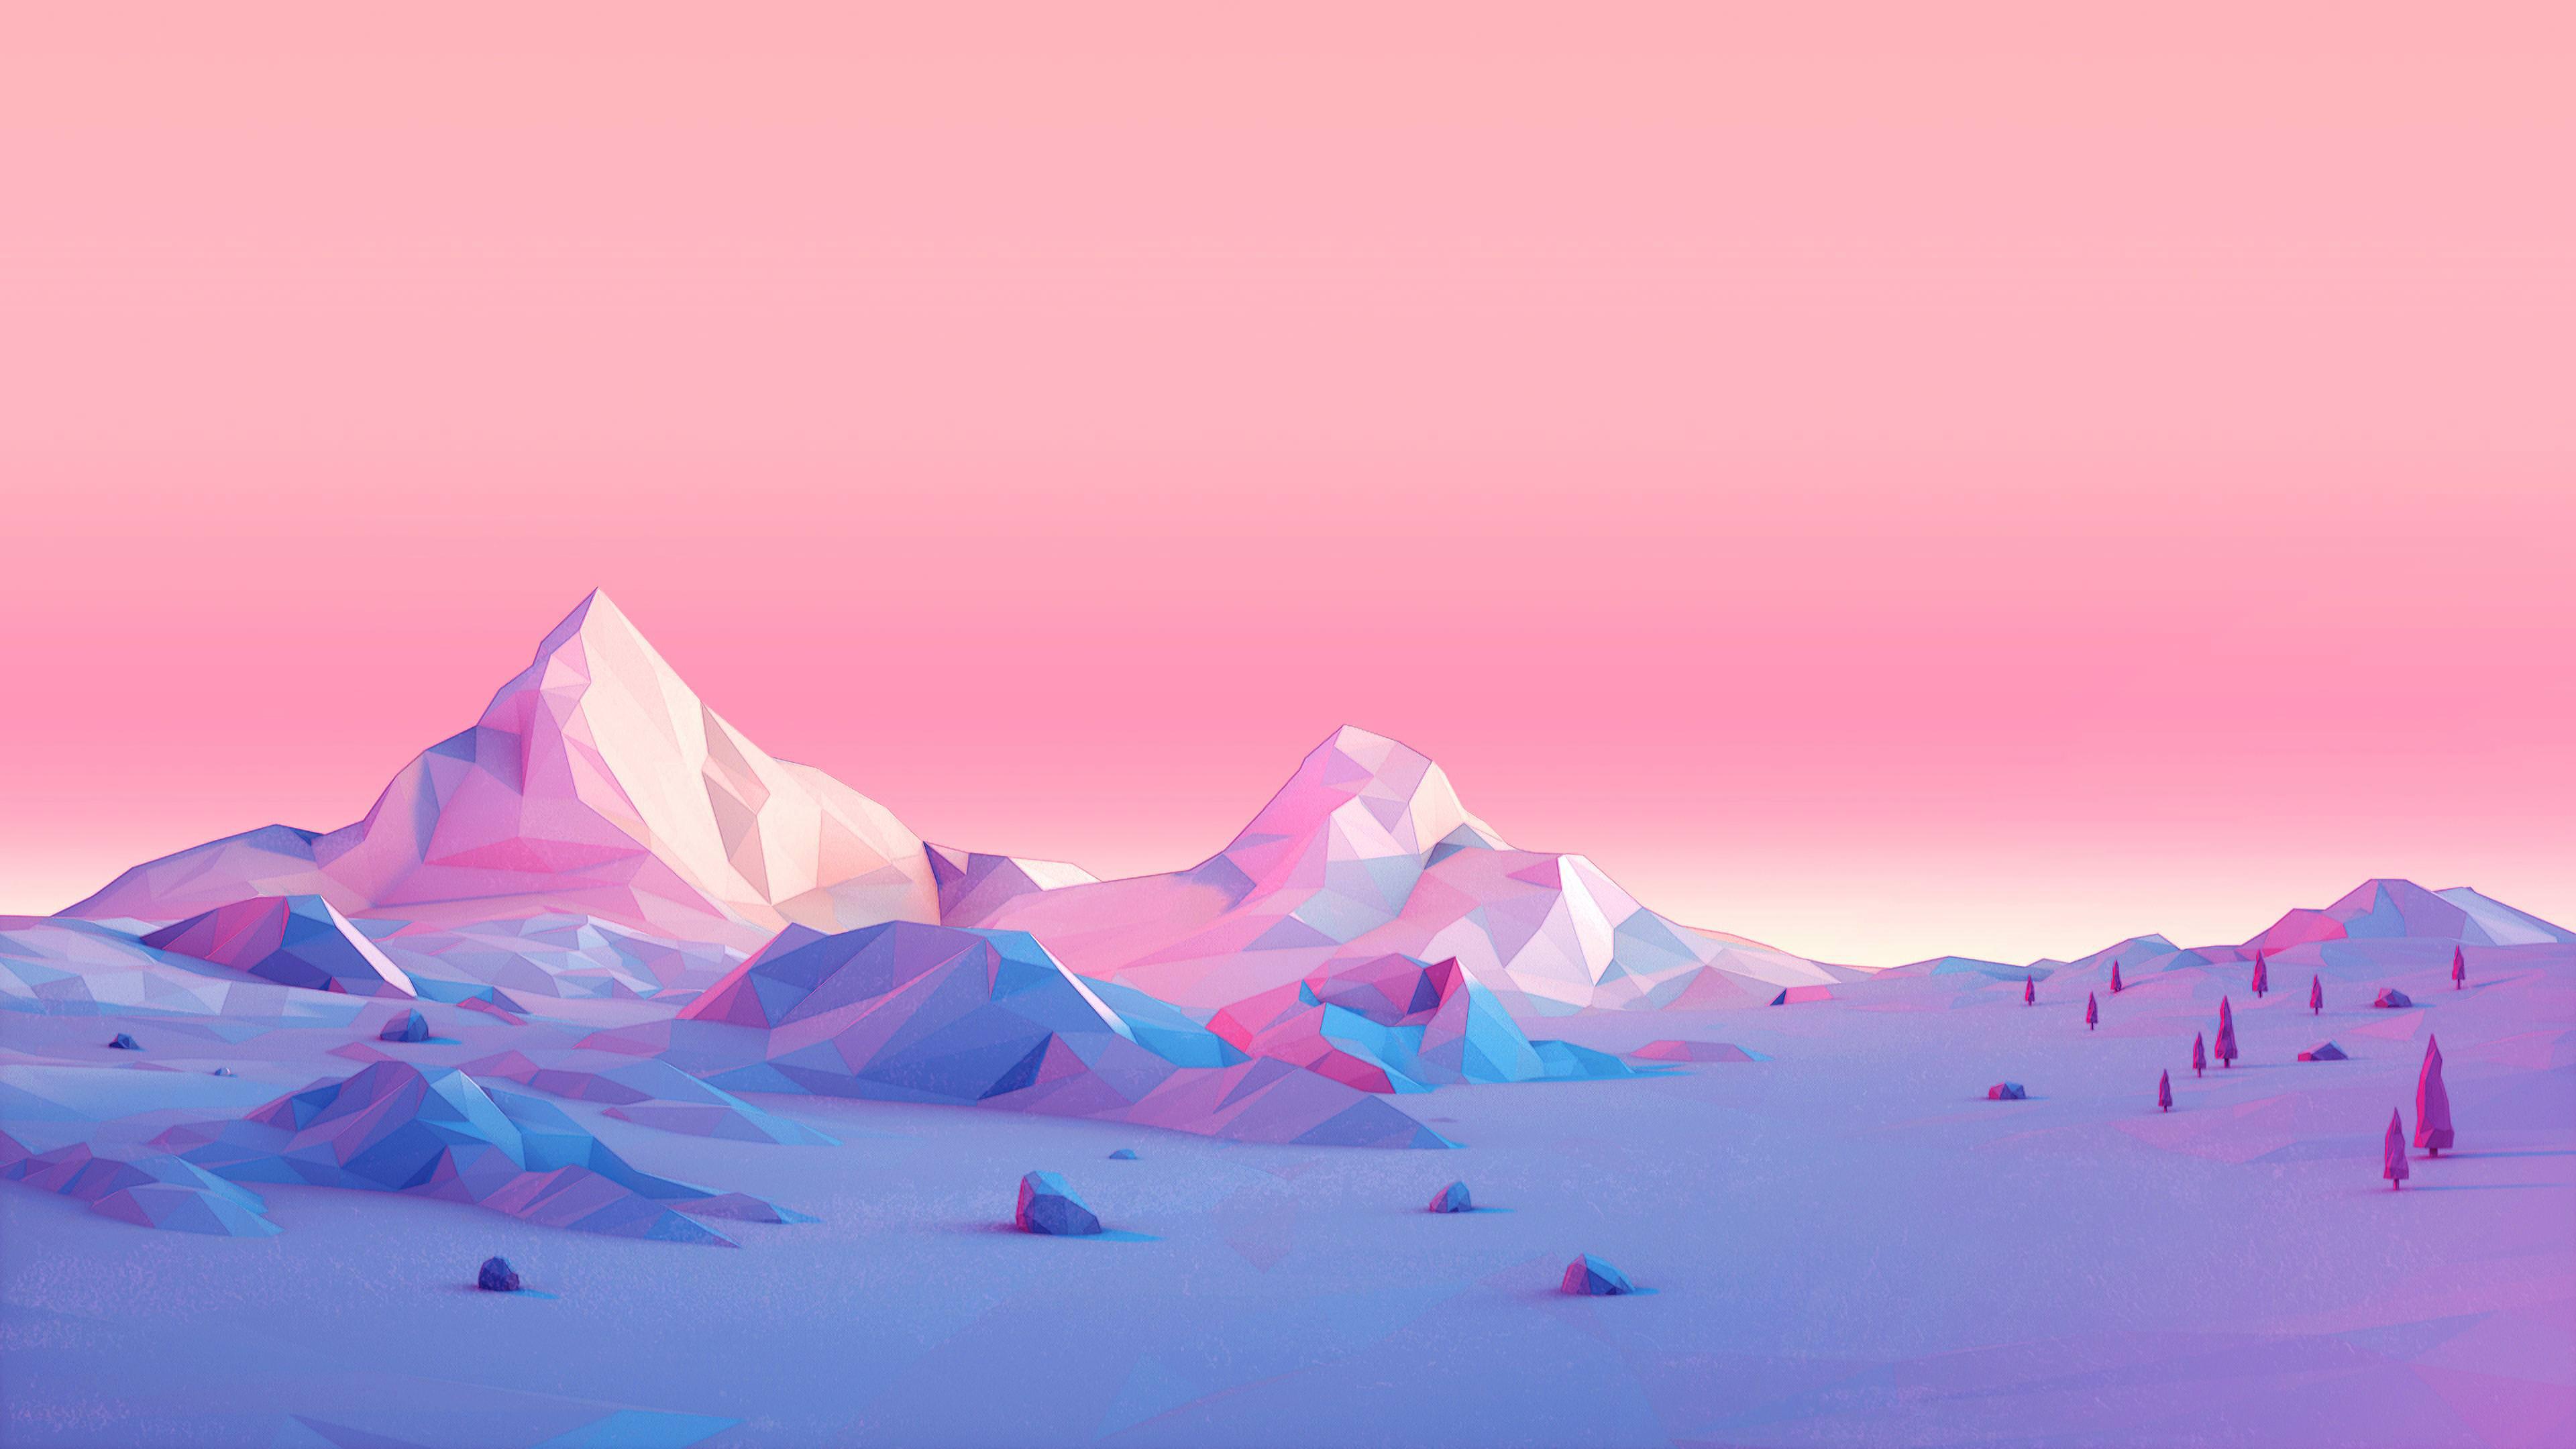 polygon mountains minimalist 4k 1540752919 - Polygon Mountains Minimalist 4k - polygon wallpapers, mountains wallpapers, minimalist wallpapers, minimalism wallpapers, low poly wallpapers, hd-wallpapers, digital art wallpapers, artwork wallpapers, artist wallpapers